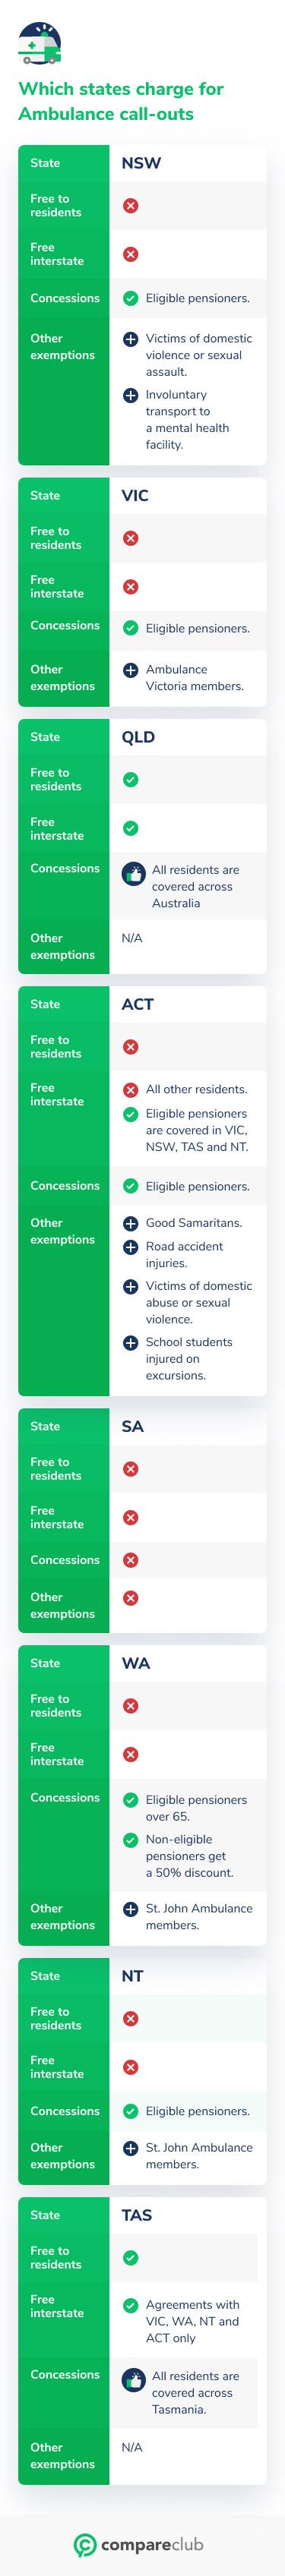 States that charge ambulance callouts